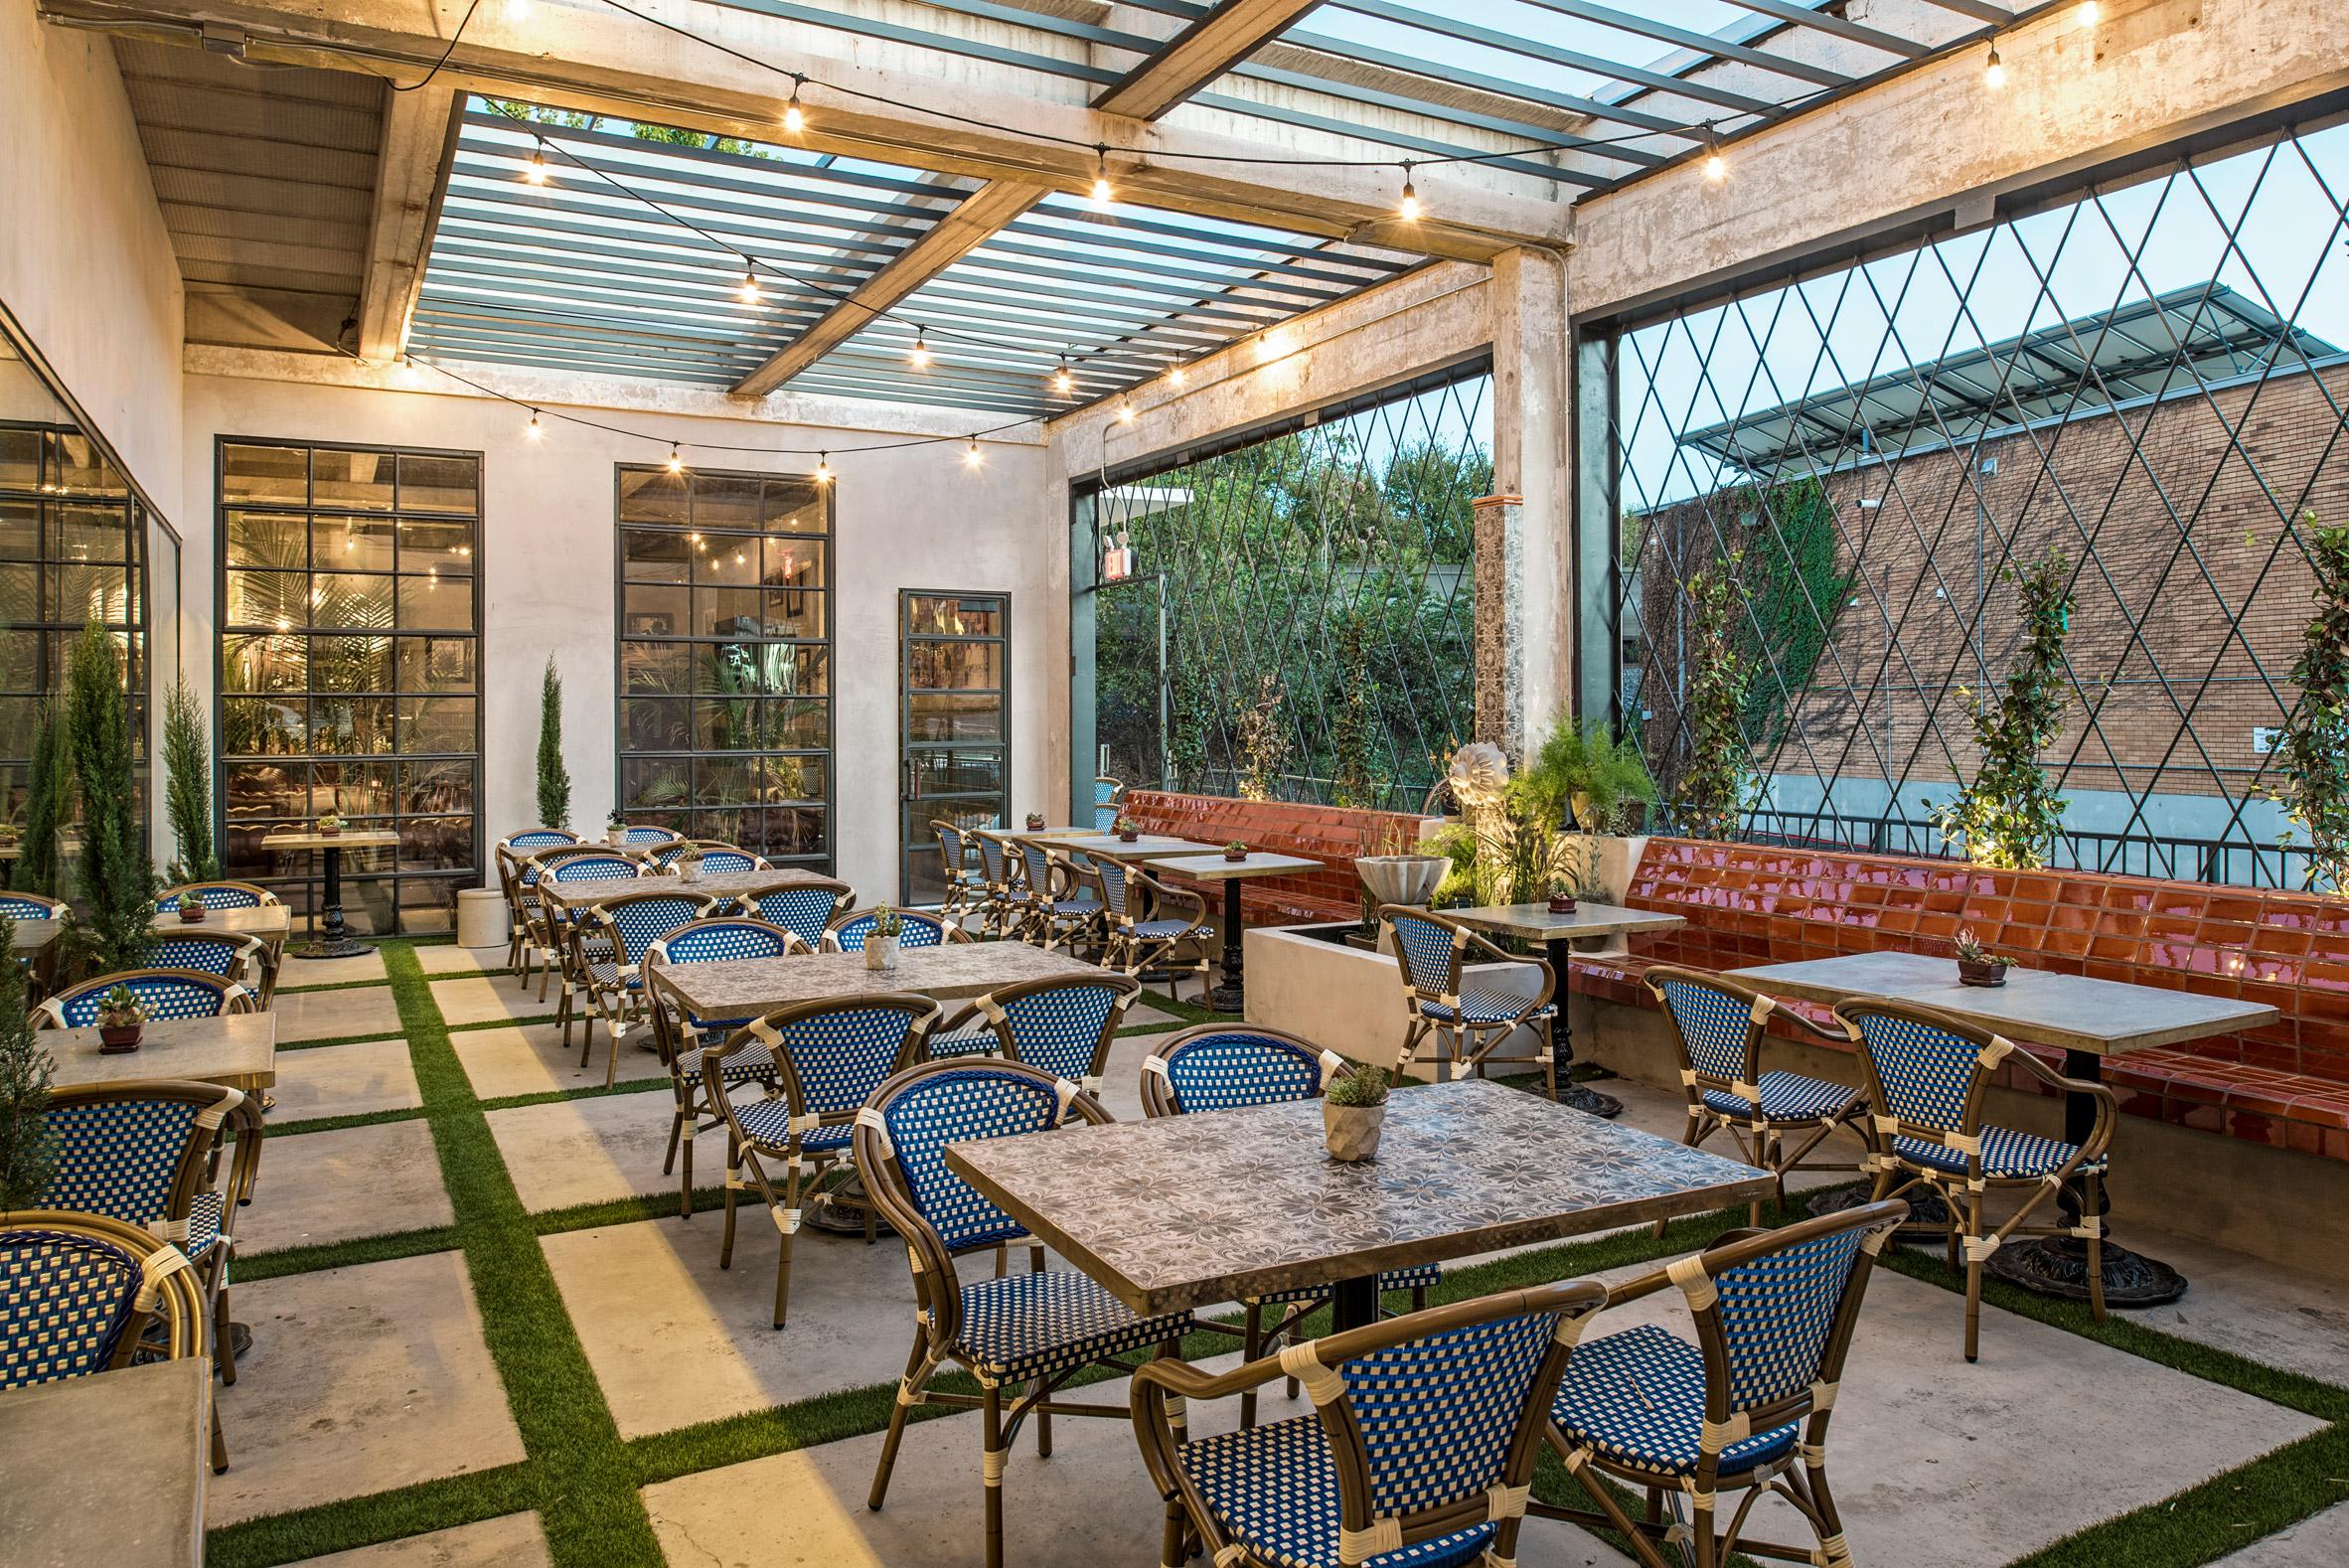 Eberly restaurant by Clayton & Little